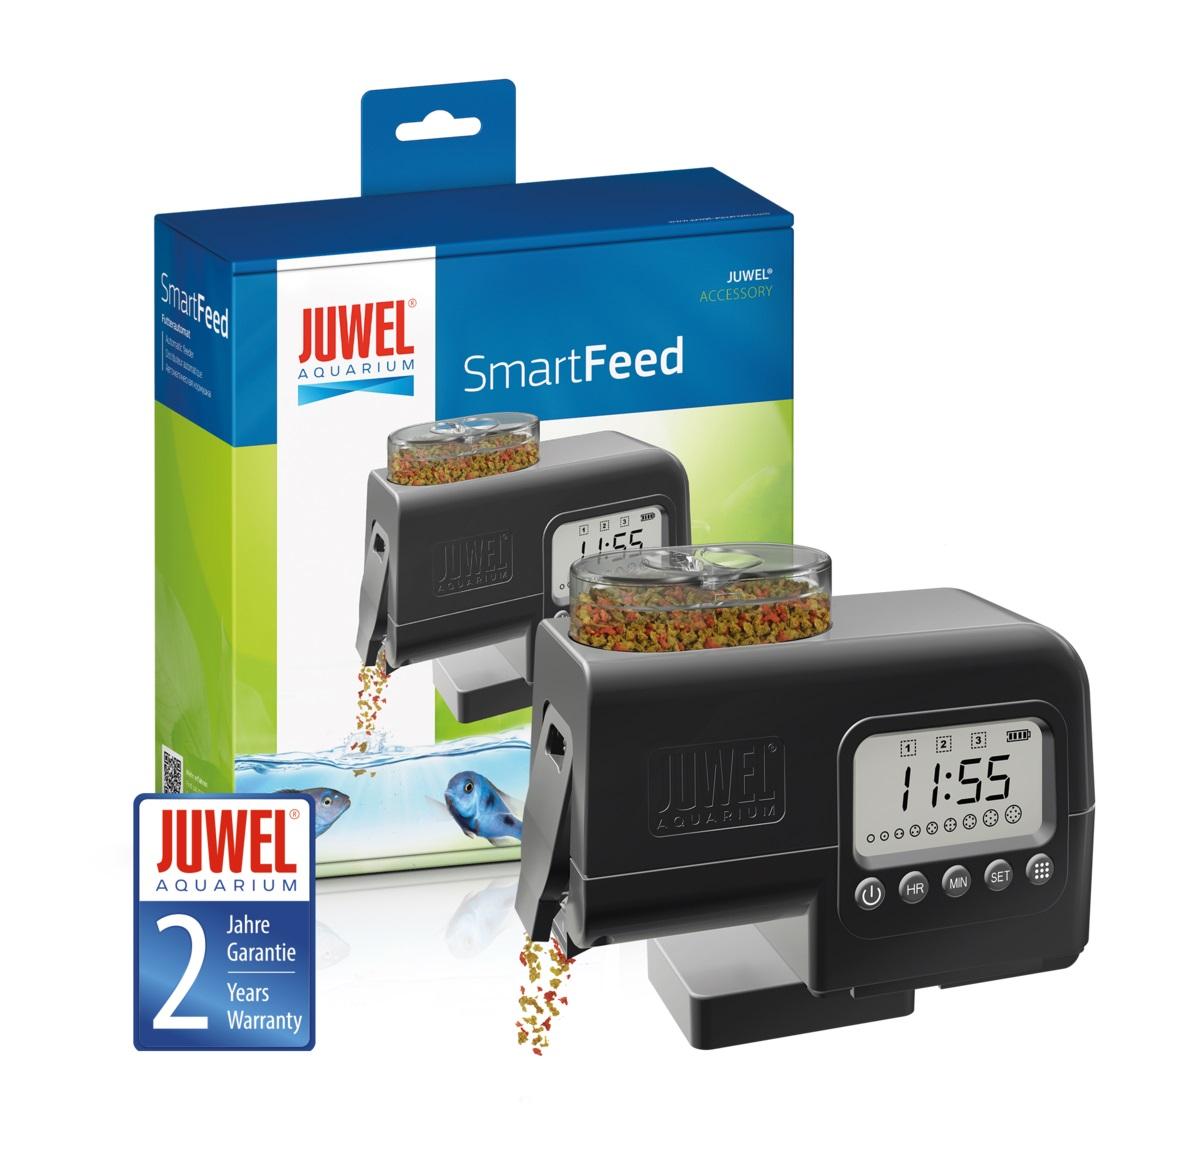 juwel-smart-feed-distributeur-de-nourriture-avec-ecran-digital-pour-aquarium